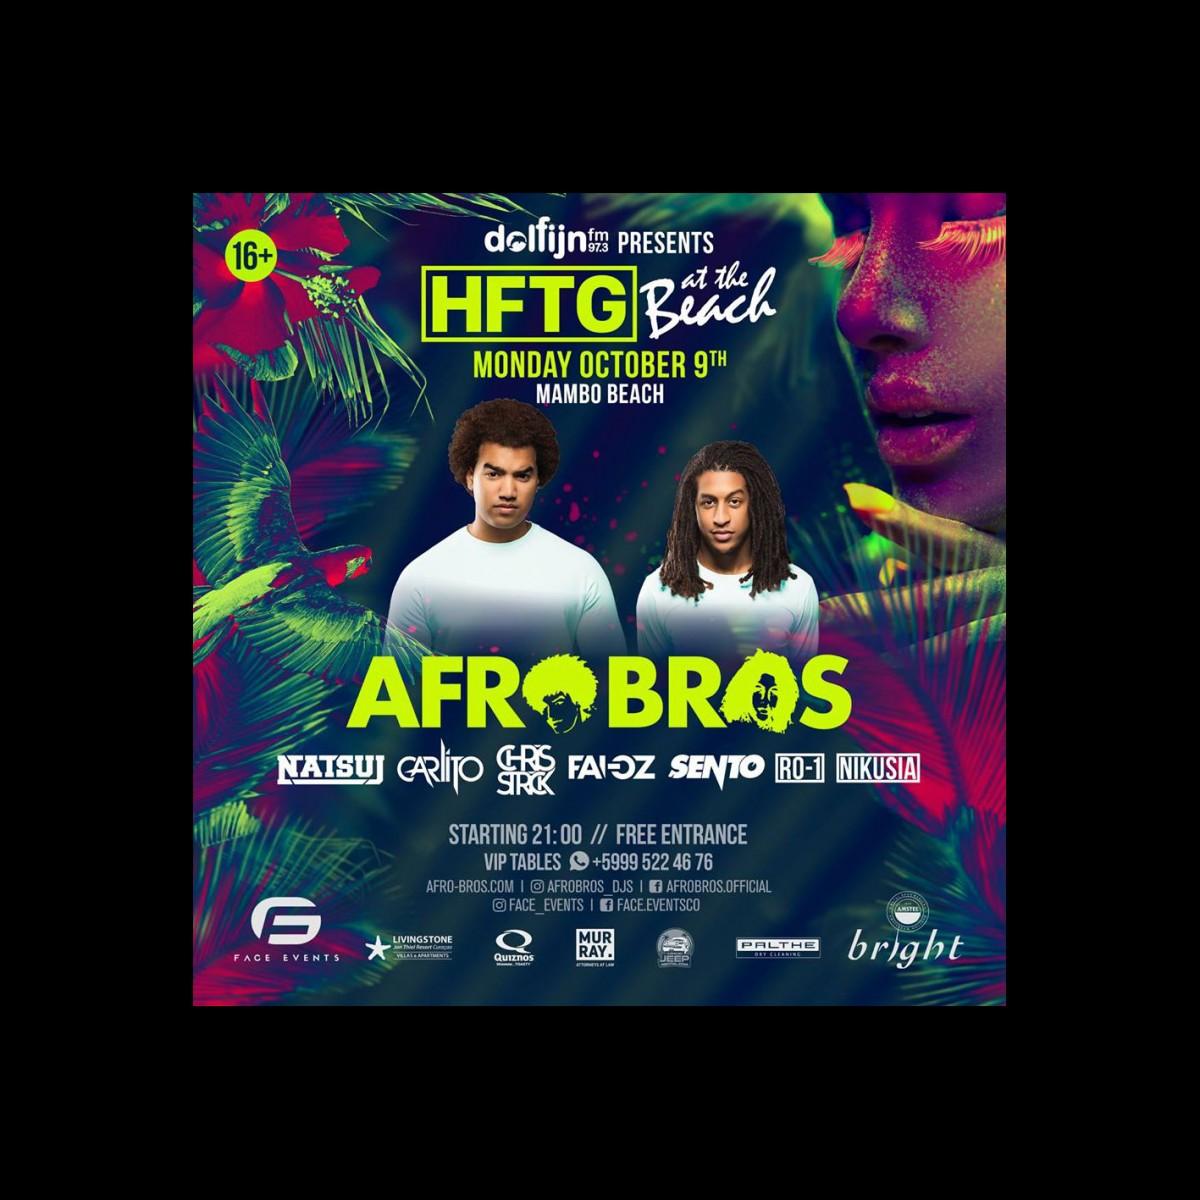 HFTG Presents: Afro Bros